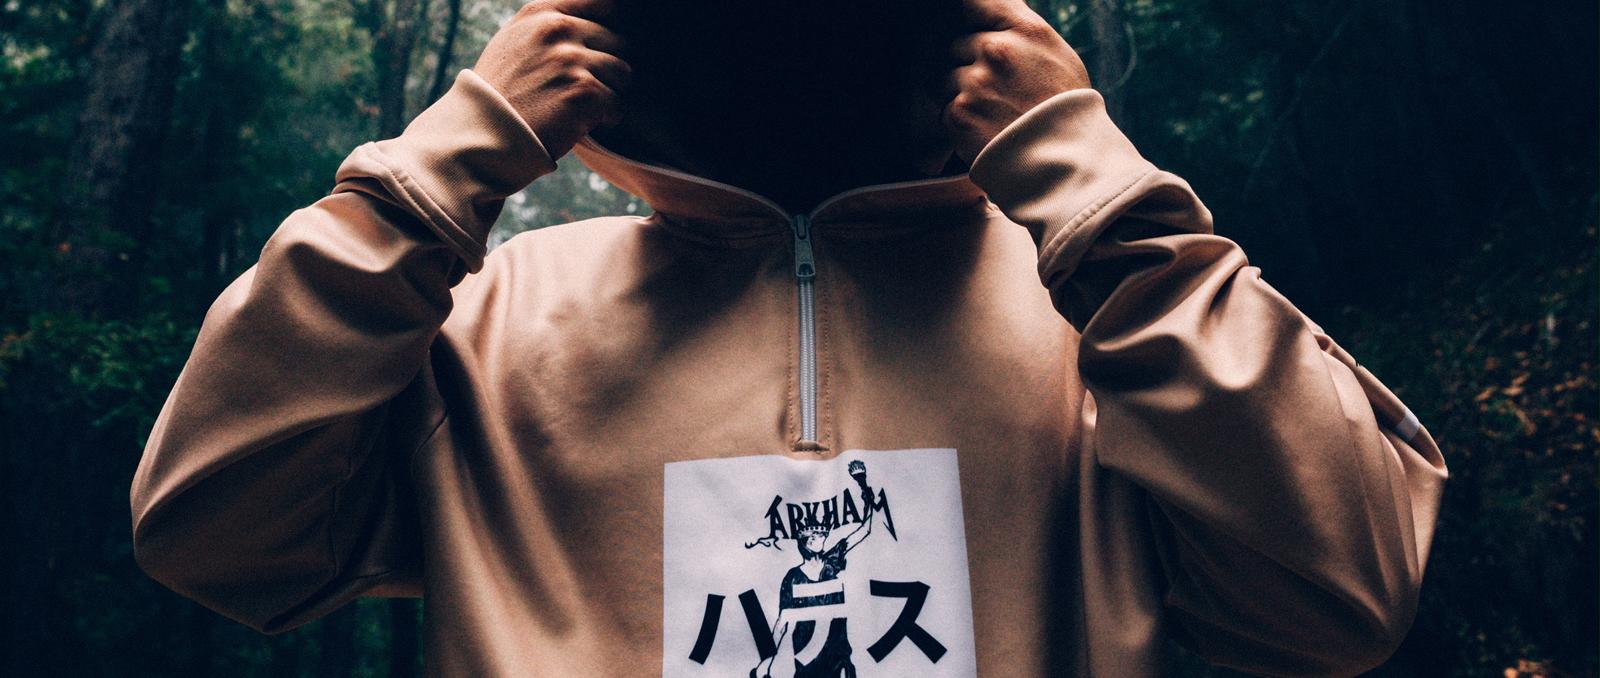 'Arkham City' Pullover